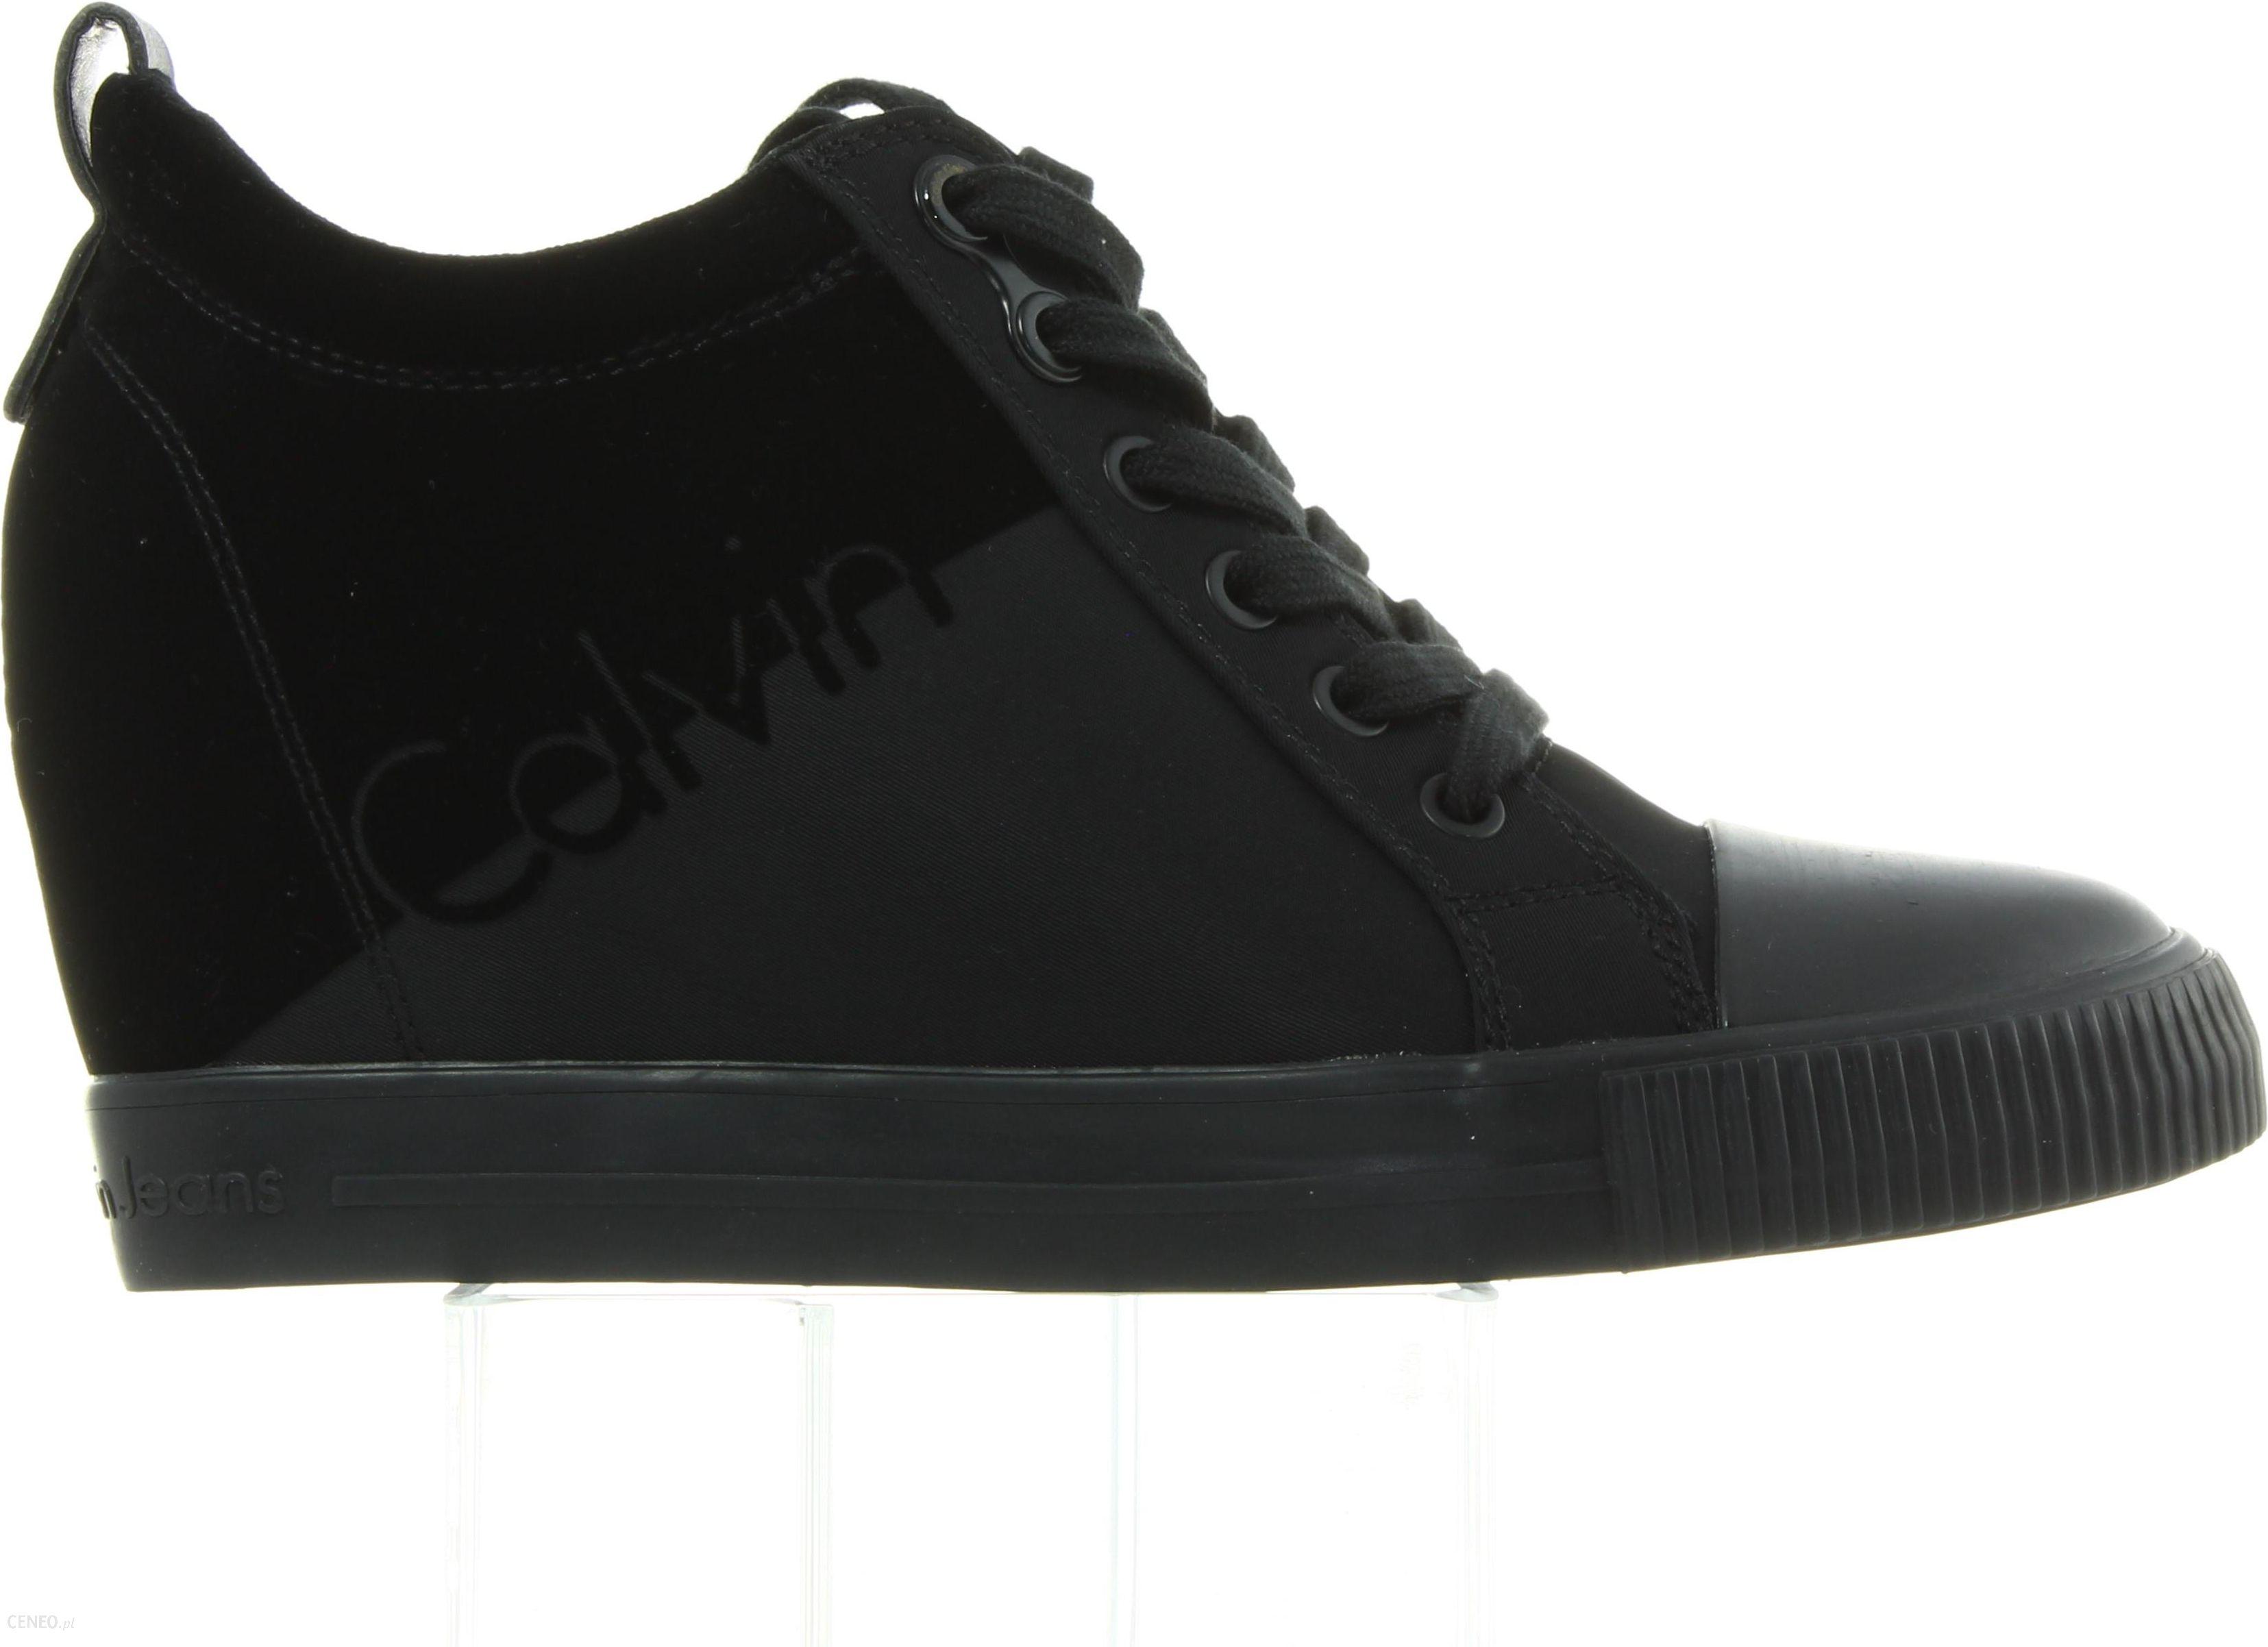 Sneakersy Calvin Klein Rory Nylon R0647 Black Black Ceny i opinie Ceneo.pl